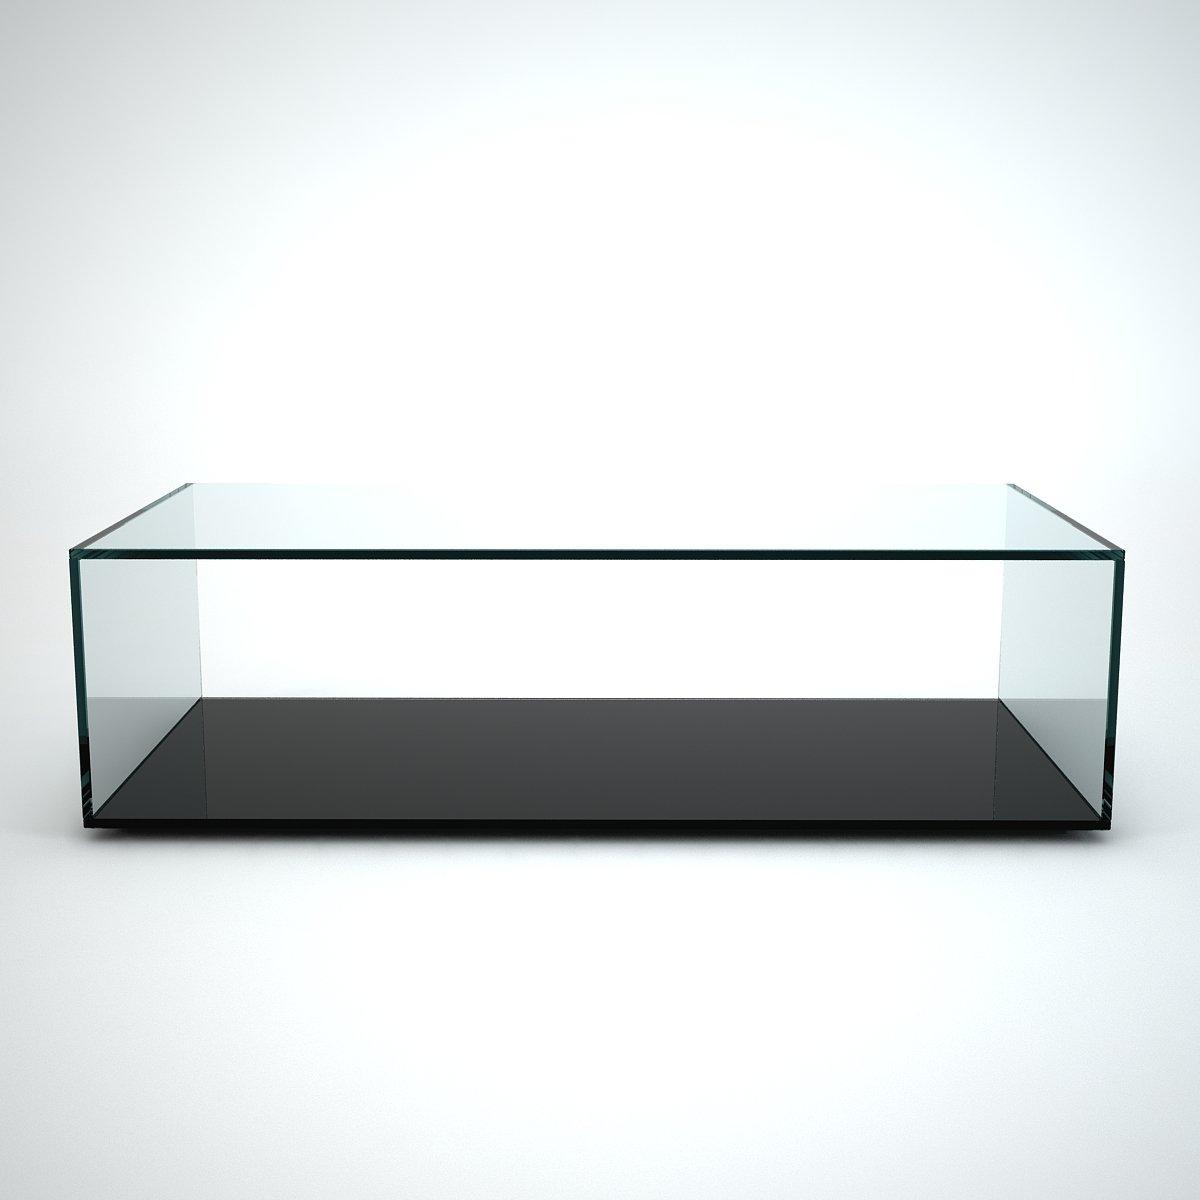 Rectangular Glass Coffee Tables Uk: Quebec Rectangular Glass Coffee Table By Klarity